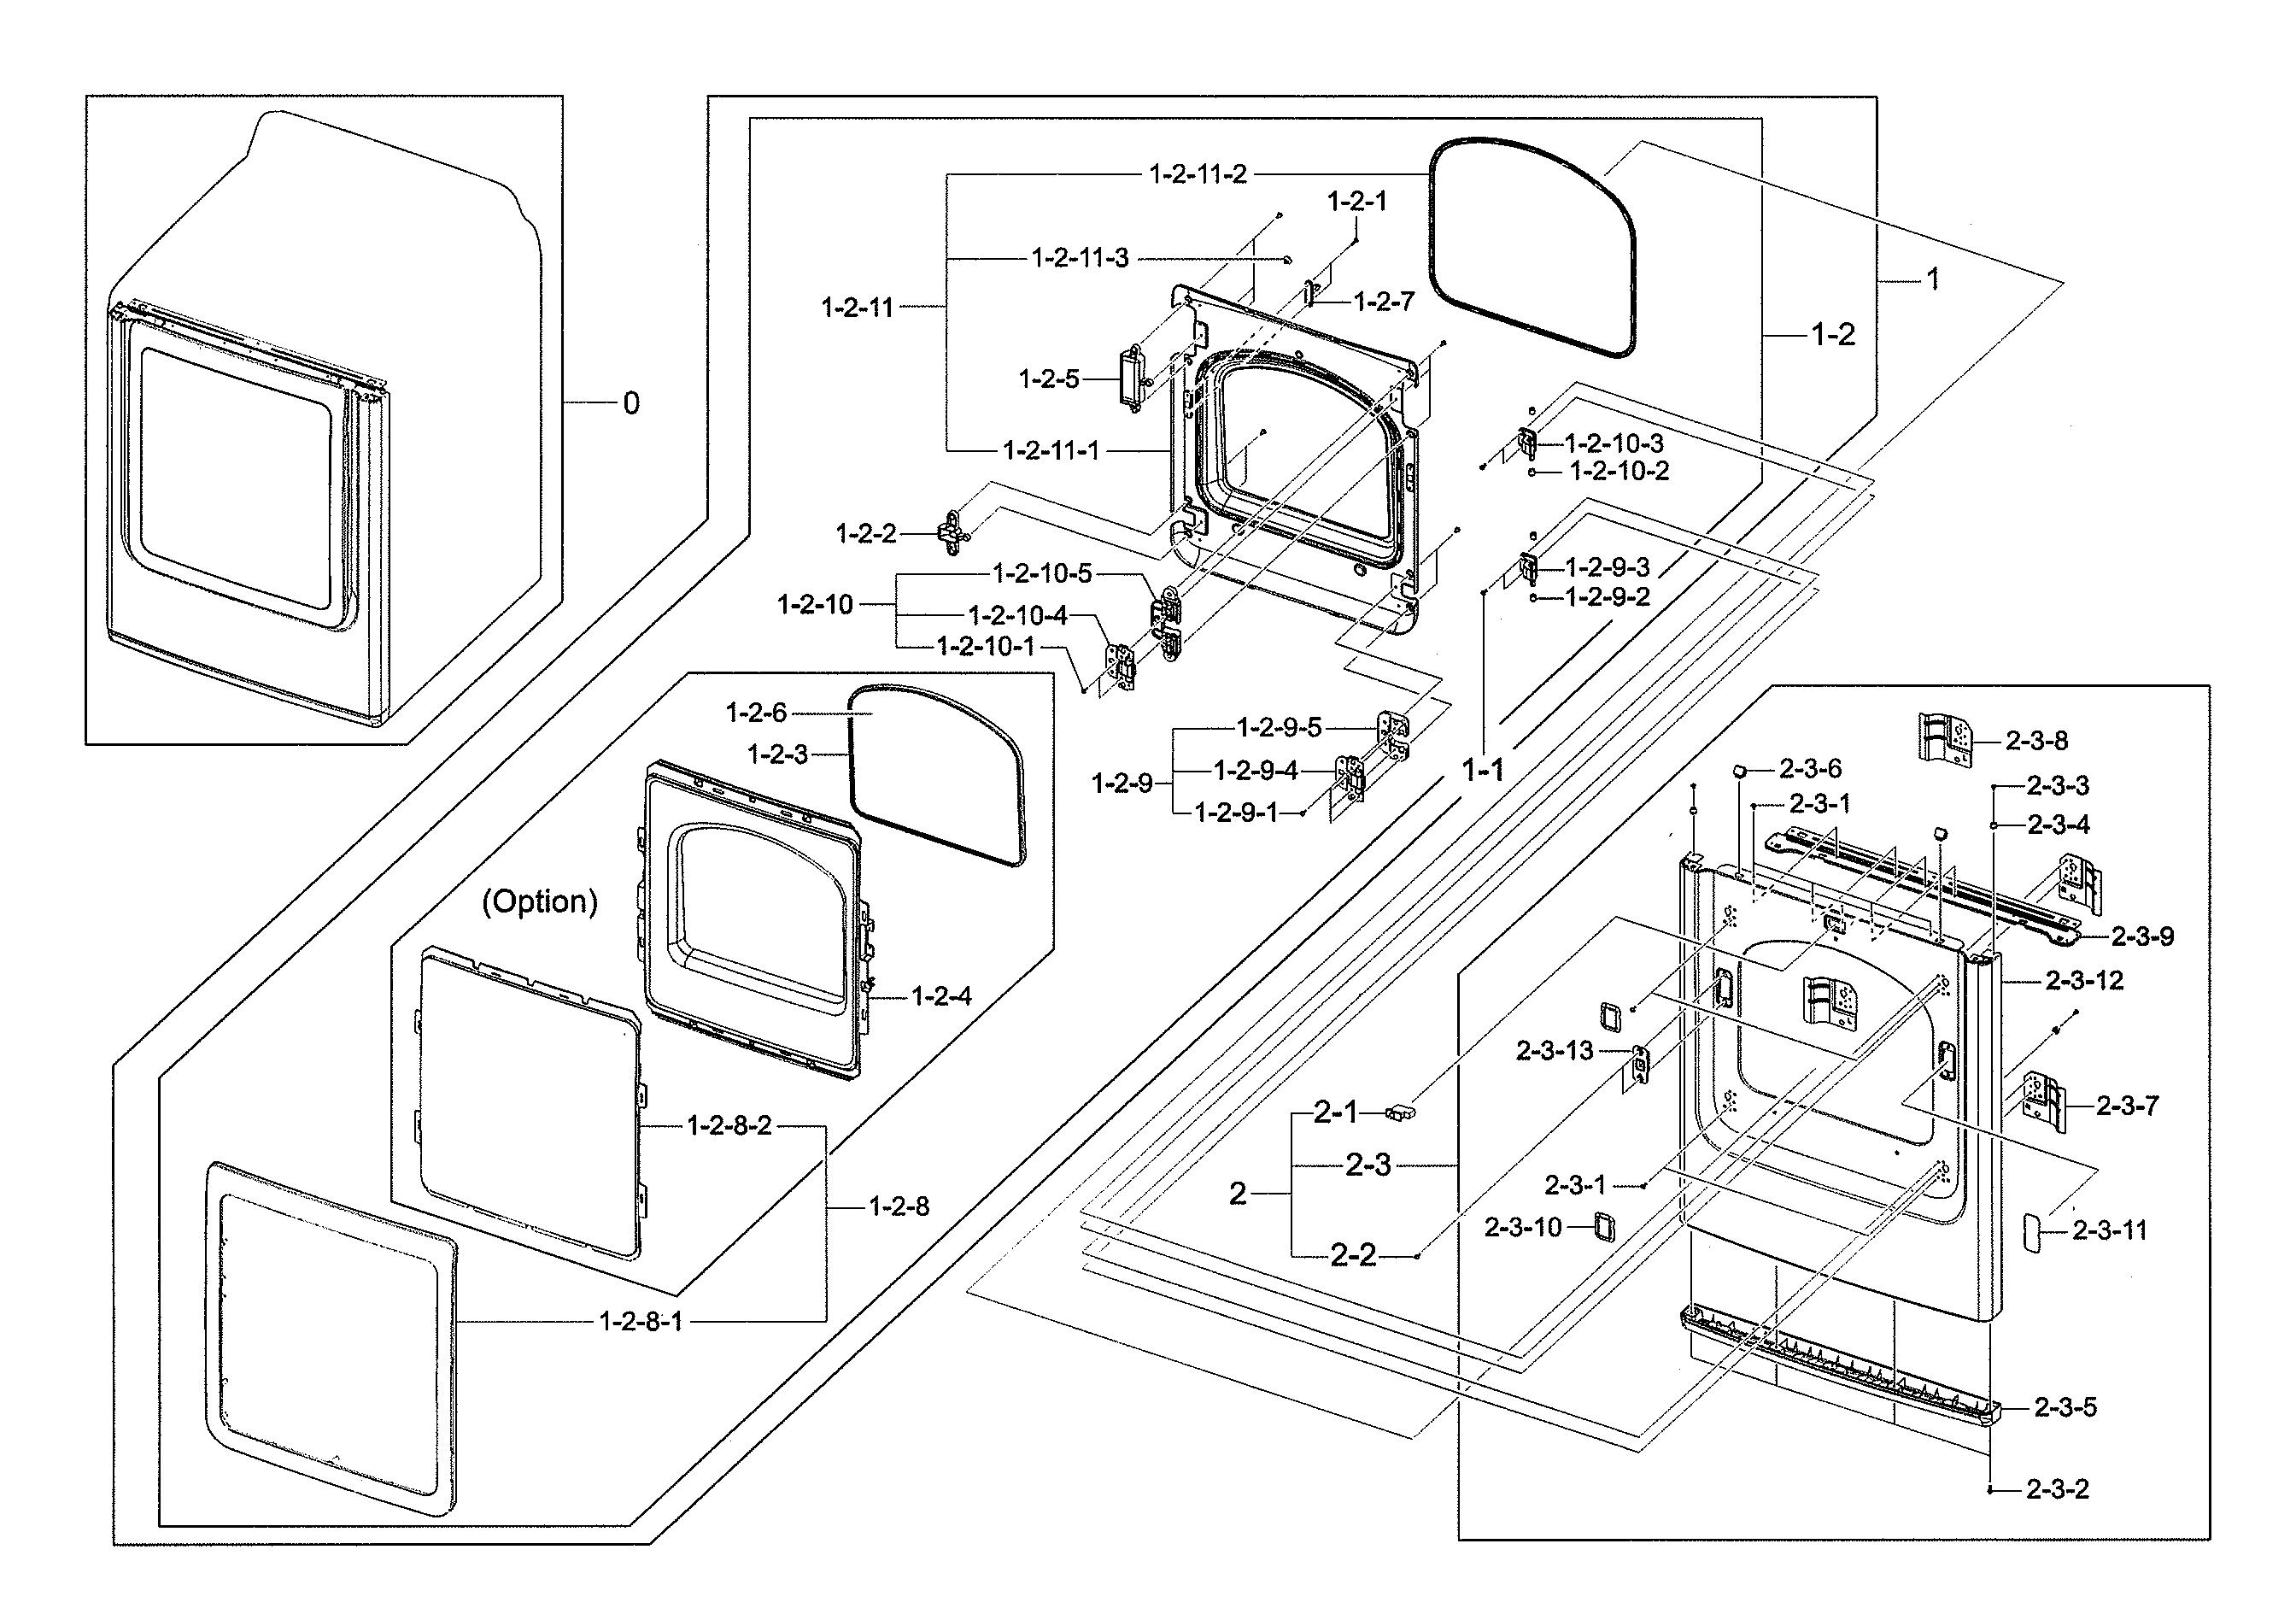 1966 Ford Thunderbird Fuse Diagram